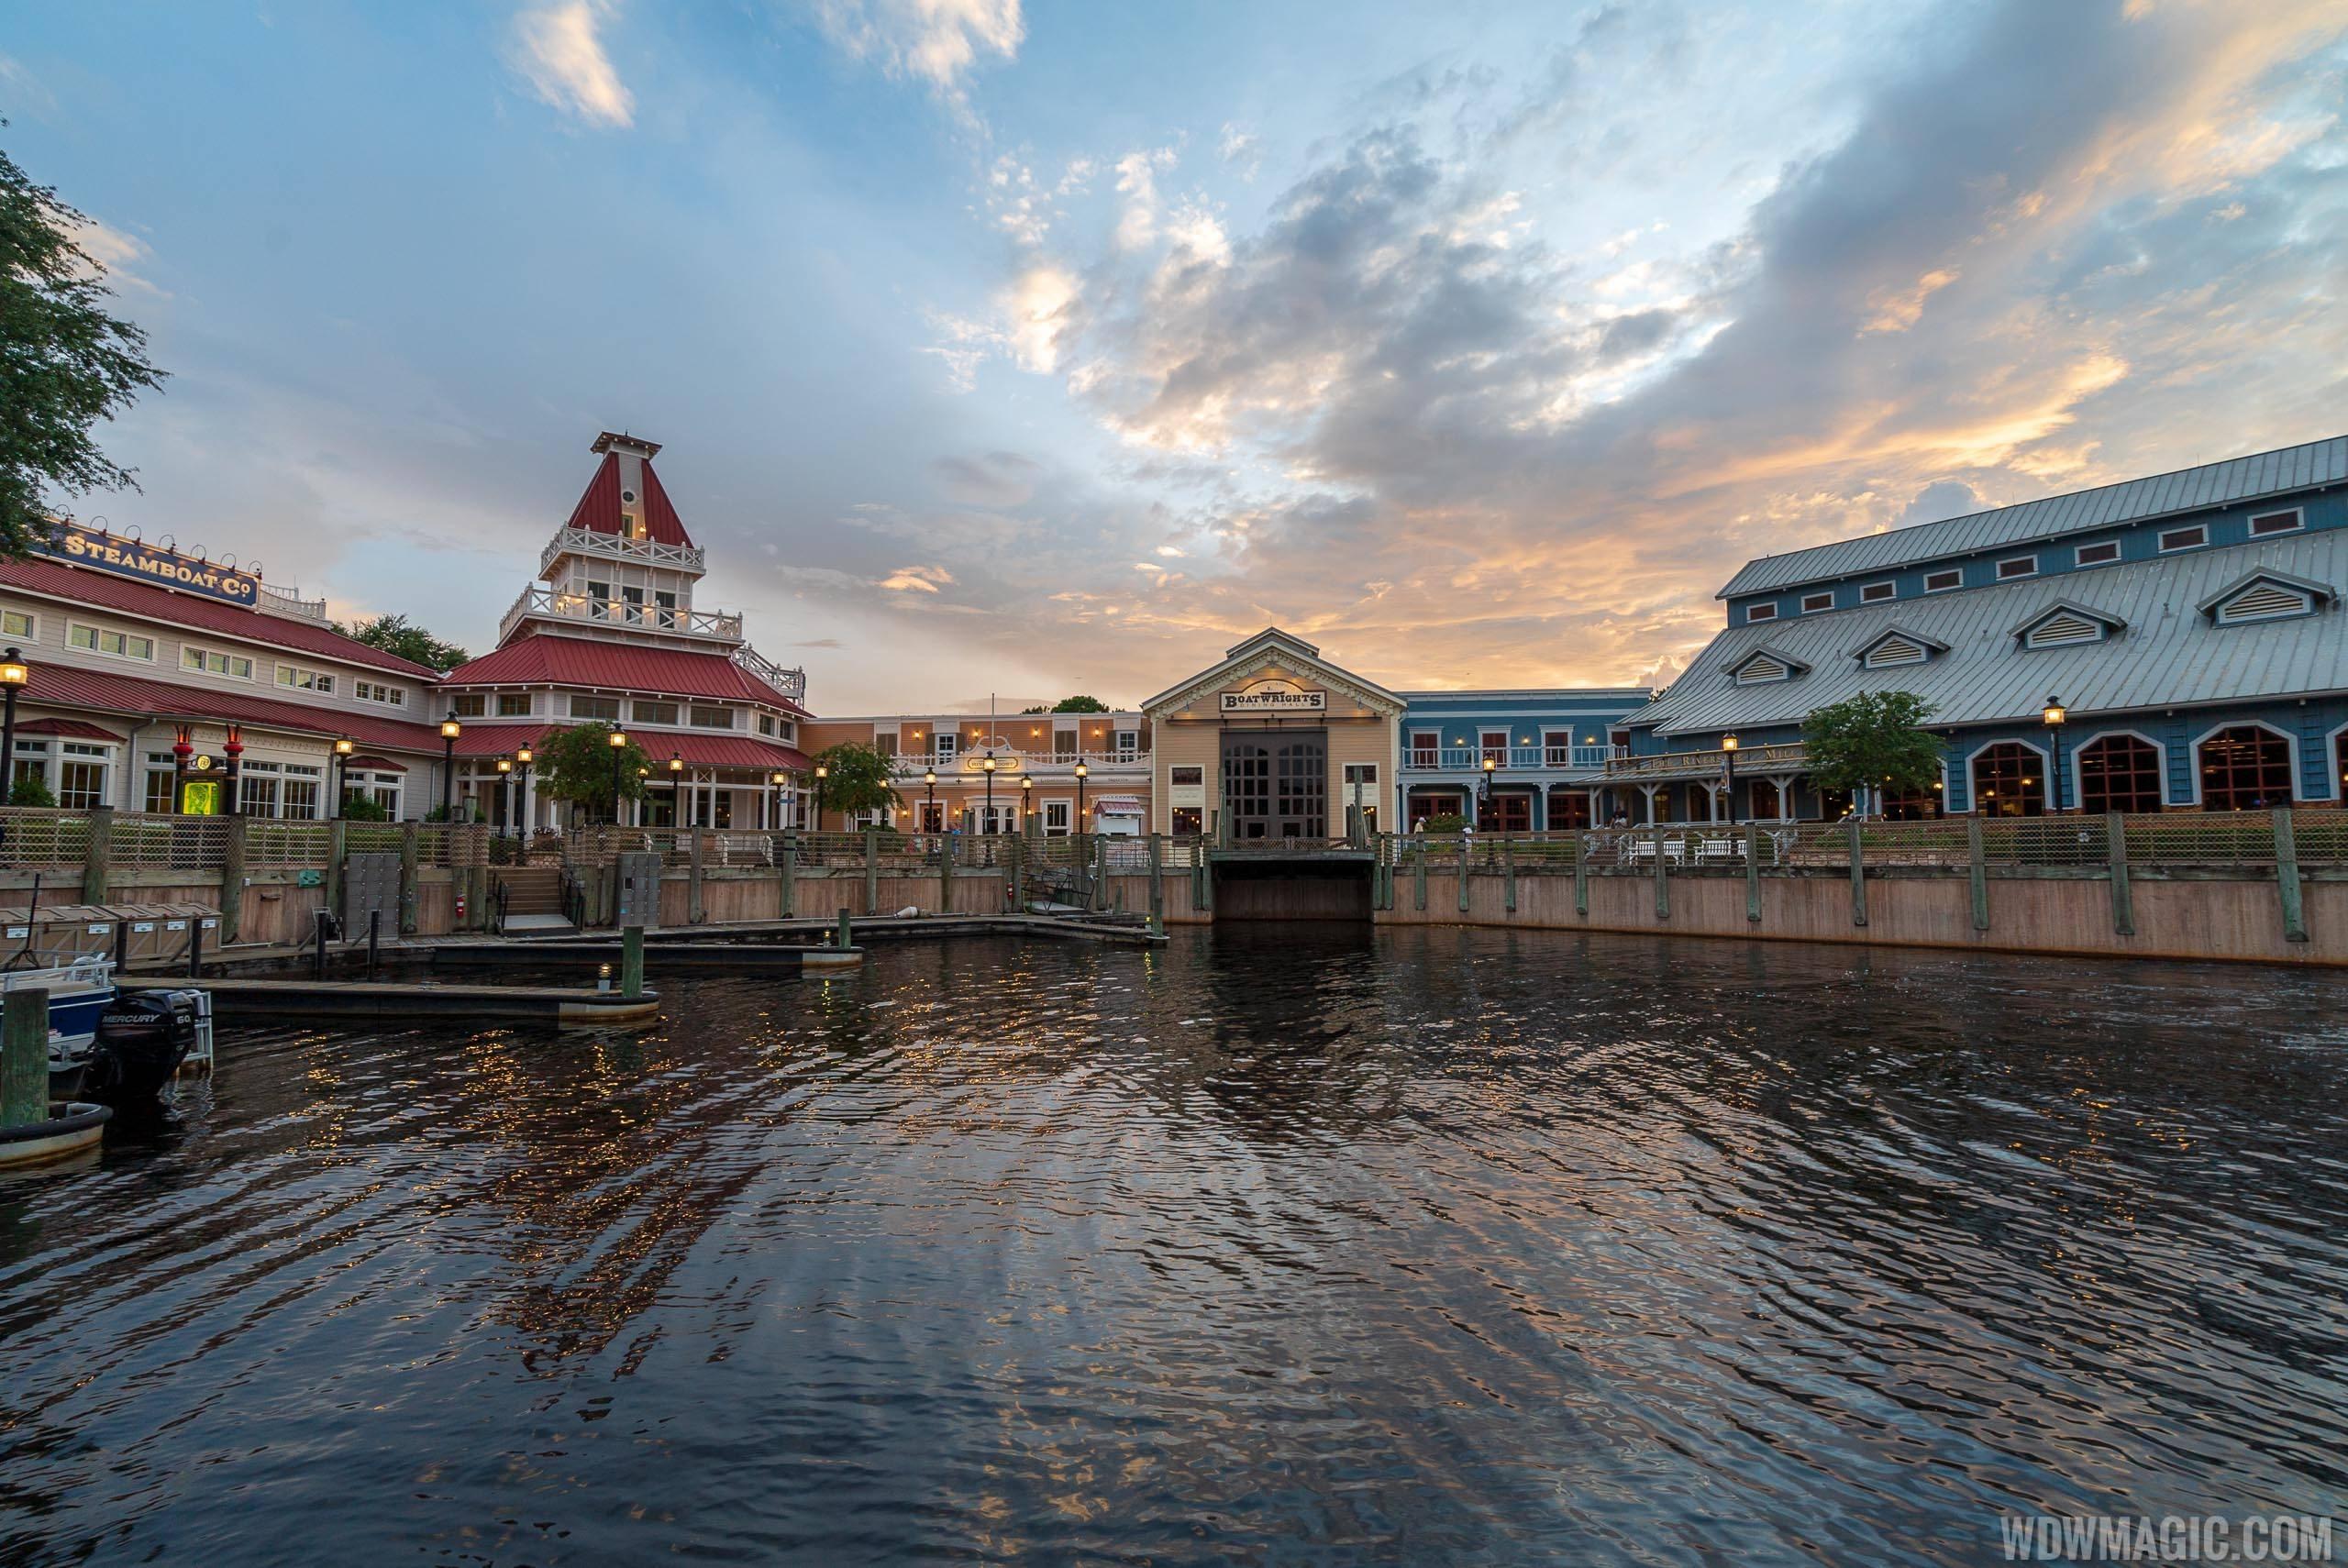 Disney's Port Orleans Riverside overview